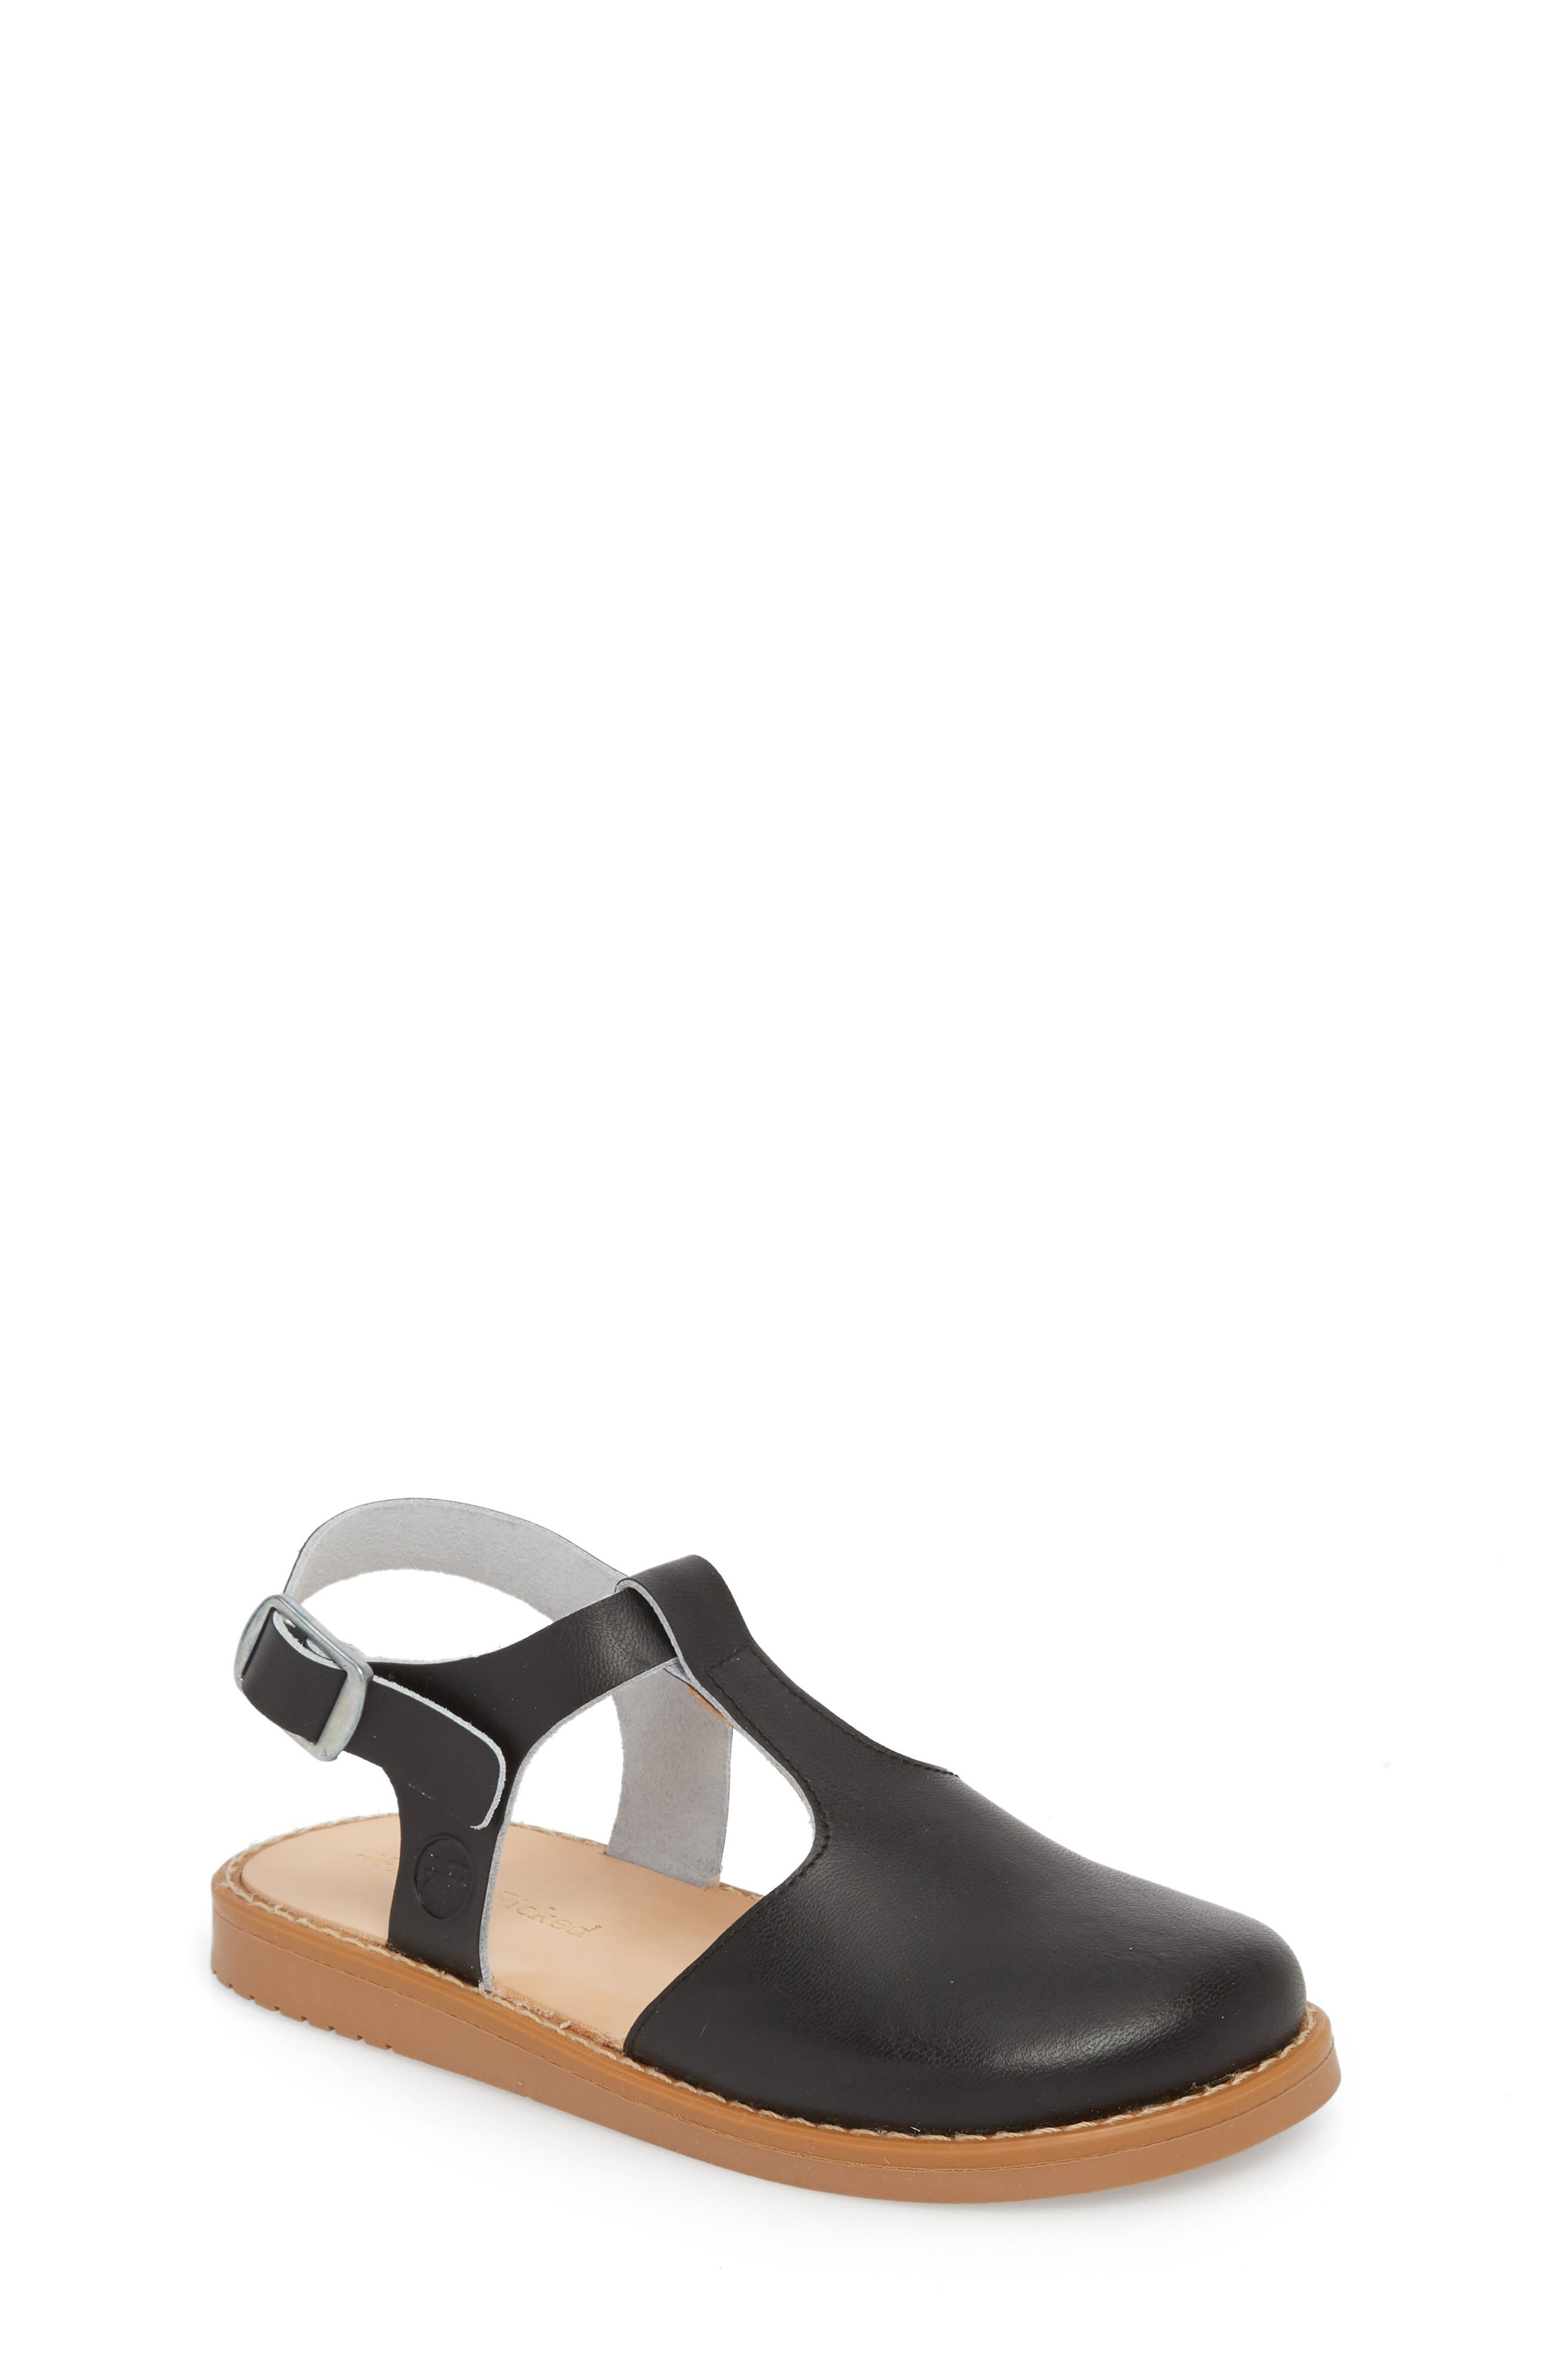 Newport Clog Sandal,                             Main thumbnail 1, color,                             BLACK